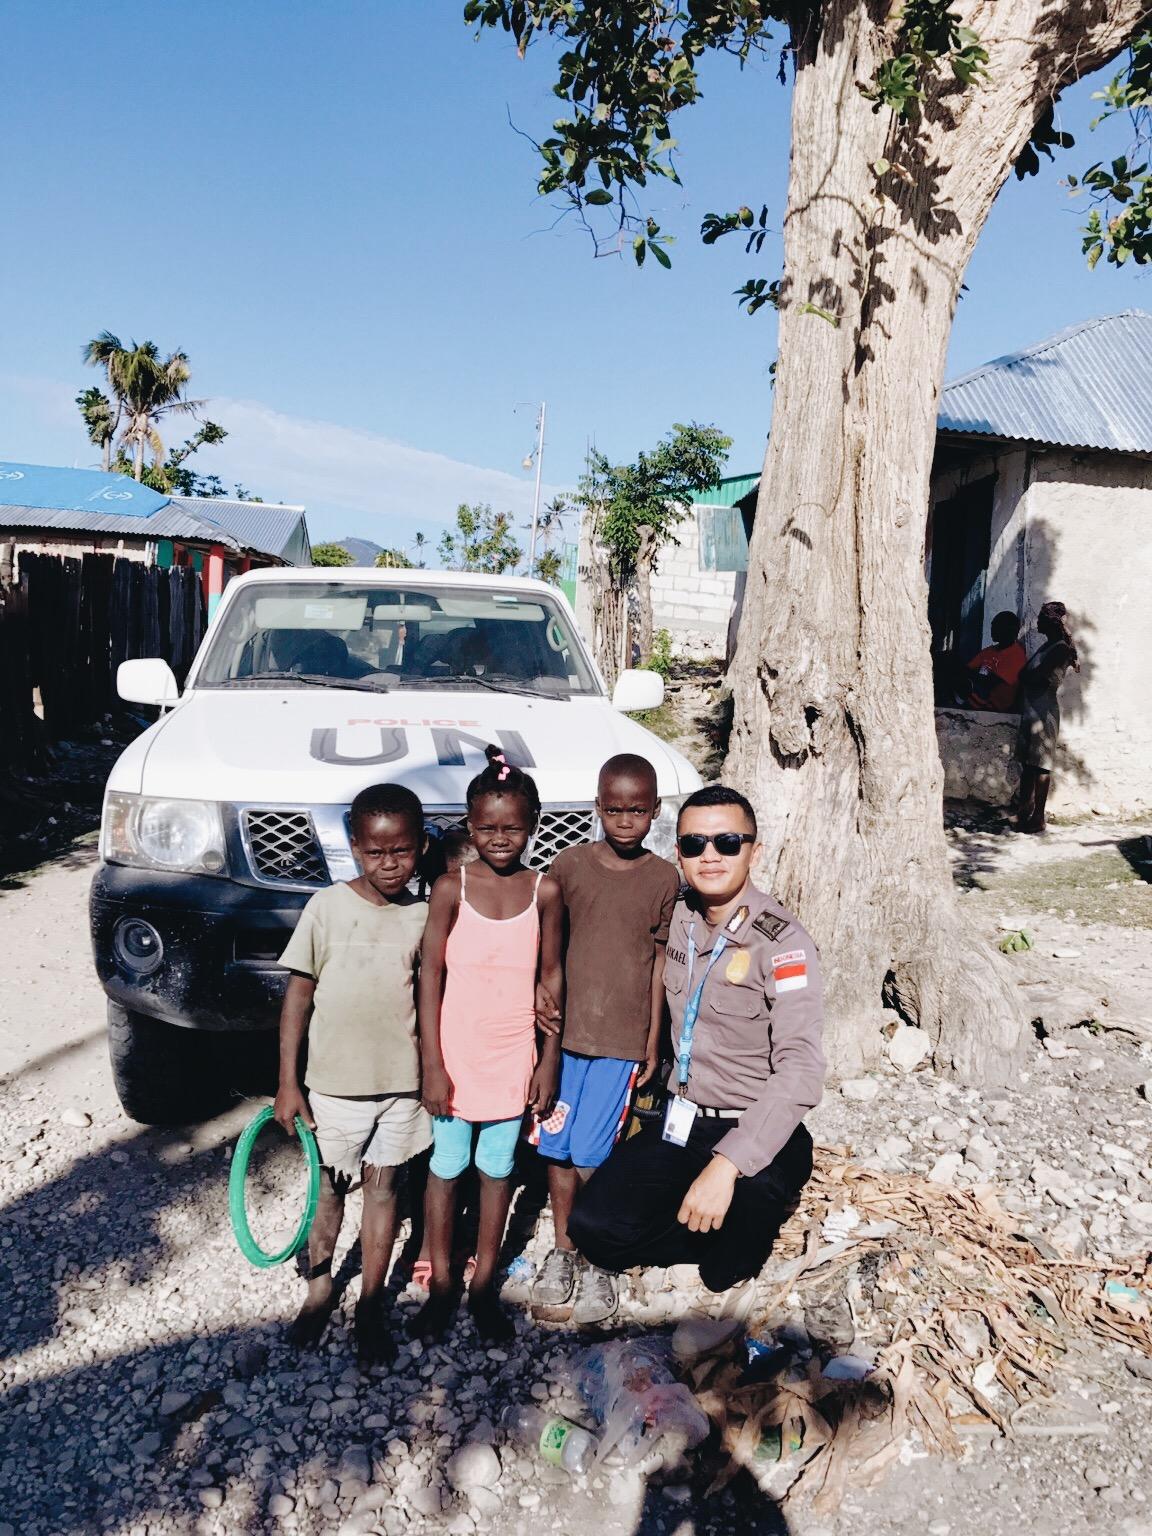 Bersama anak – anak korban badai Matthew yang melanda bagian selatan Haiti 04 Oktober 2016. PBB kerap memberikan bantuan berupa bahan makanan dan bahan bangunan kepada warga yang wilayahnya diterpa bencana badai pada waktu itu. (C)Mikael Situmorang